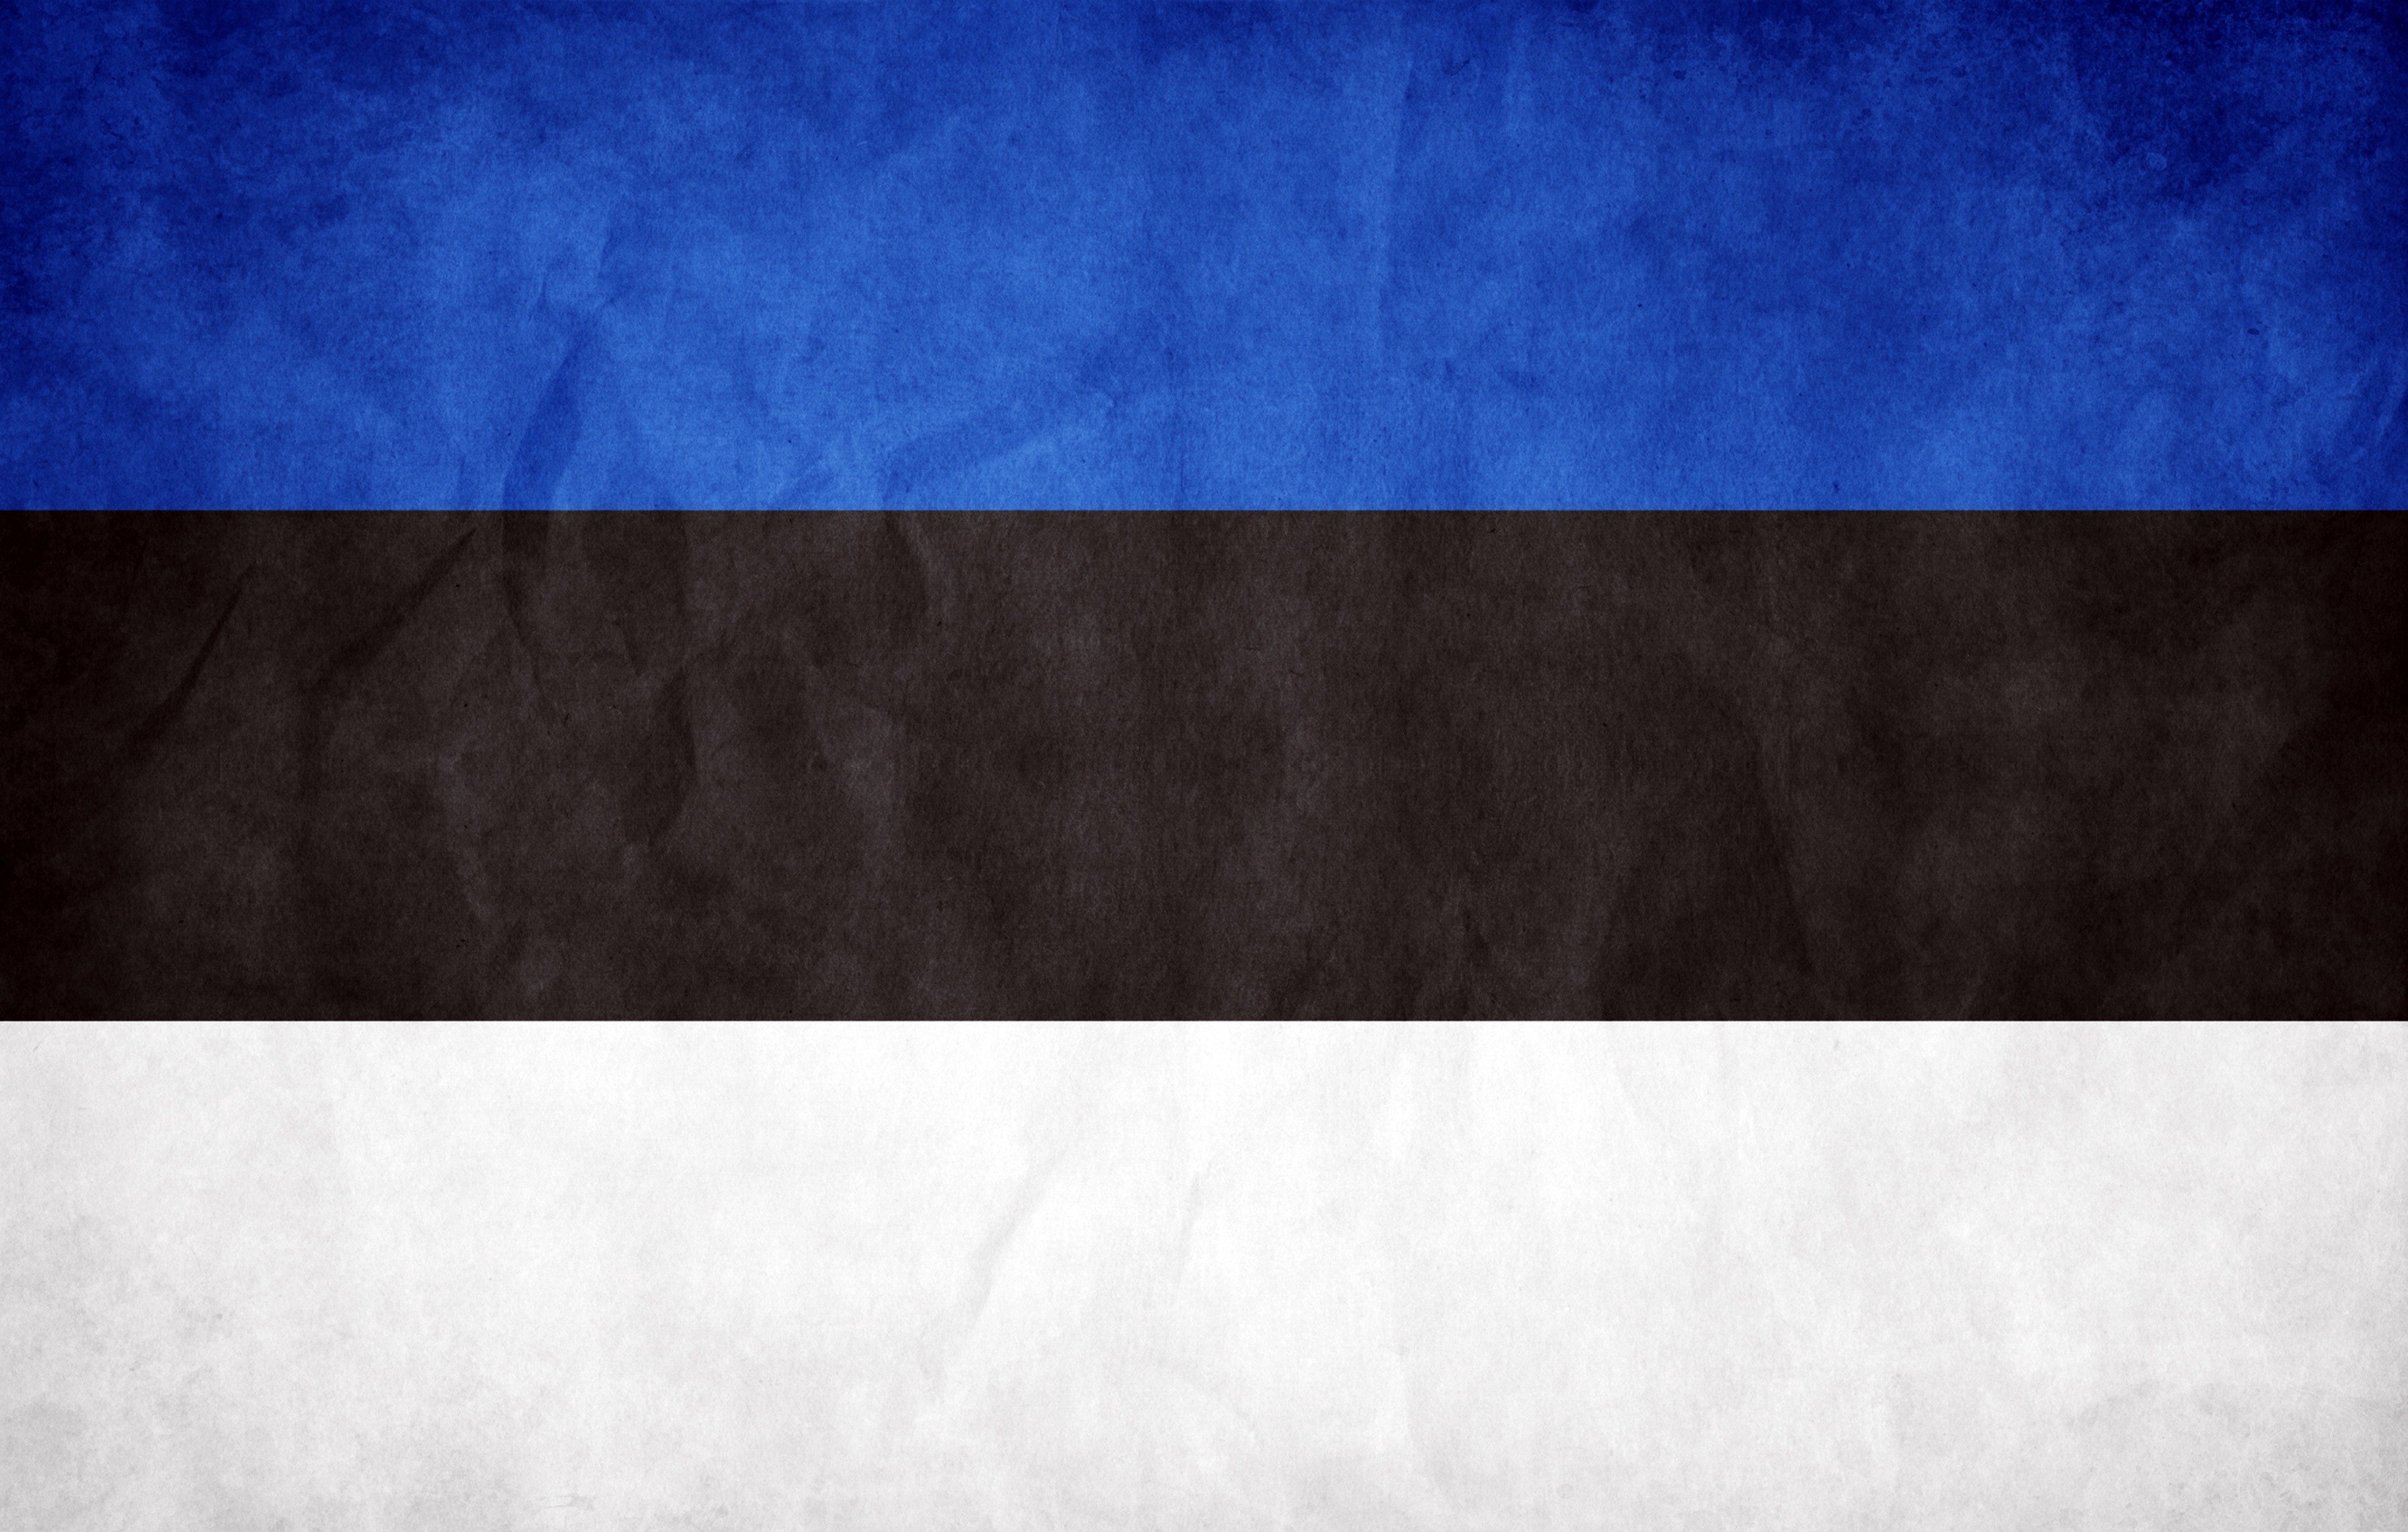 3300x2100 > Flag Of Estonia Wallpapers